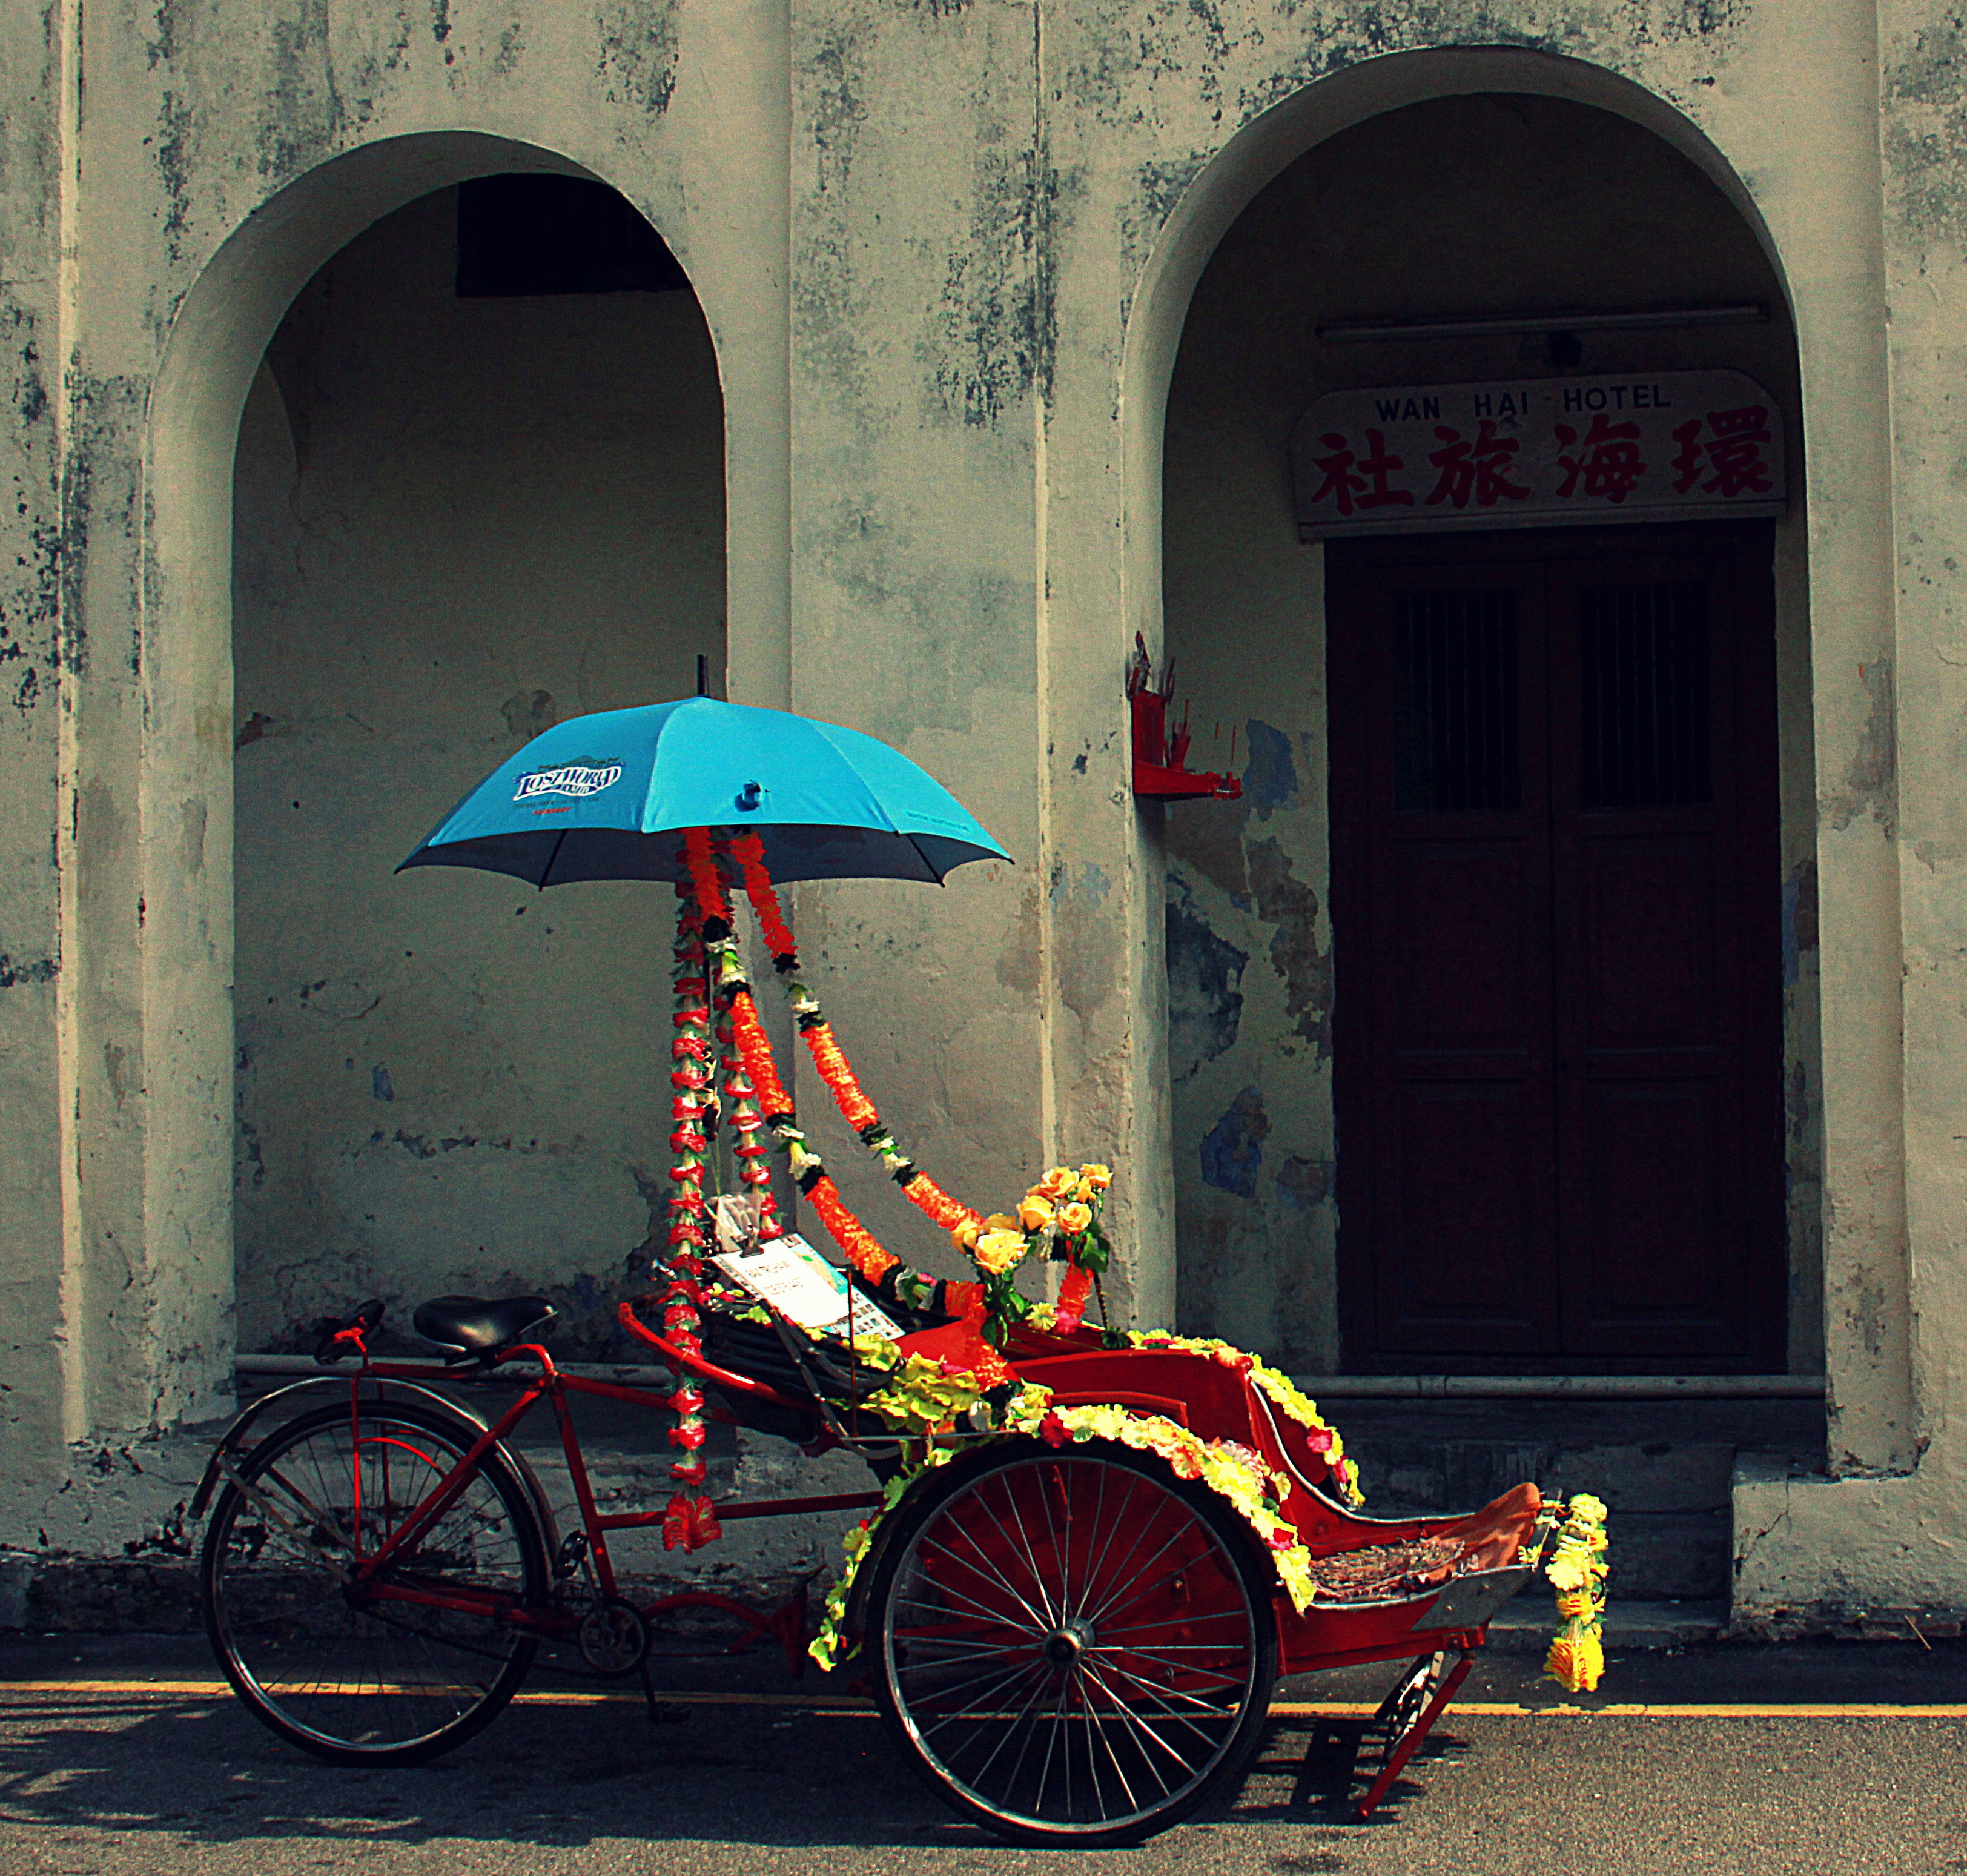 #Malaysia #Georgetown #travelblog #maverickbird